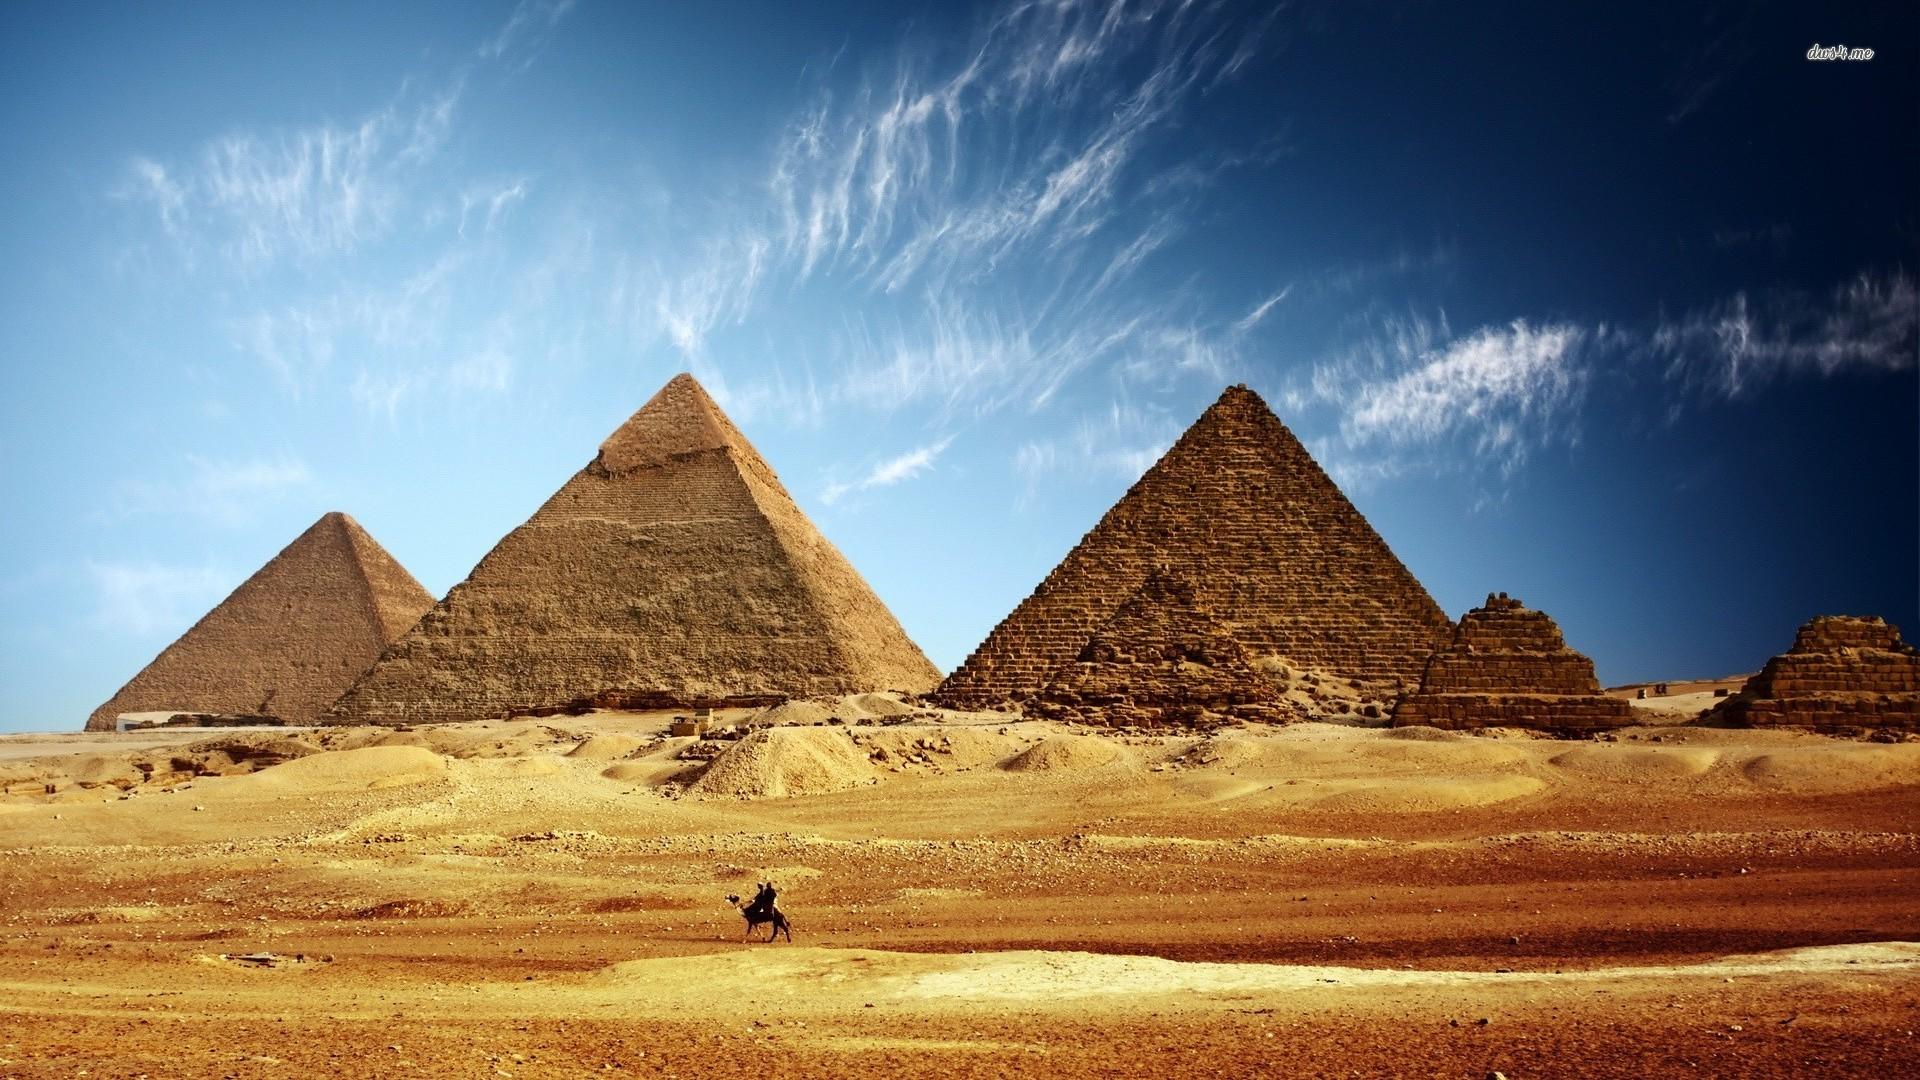 70 Giza Pyramids Wallpaper On Wallpapersafari